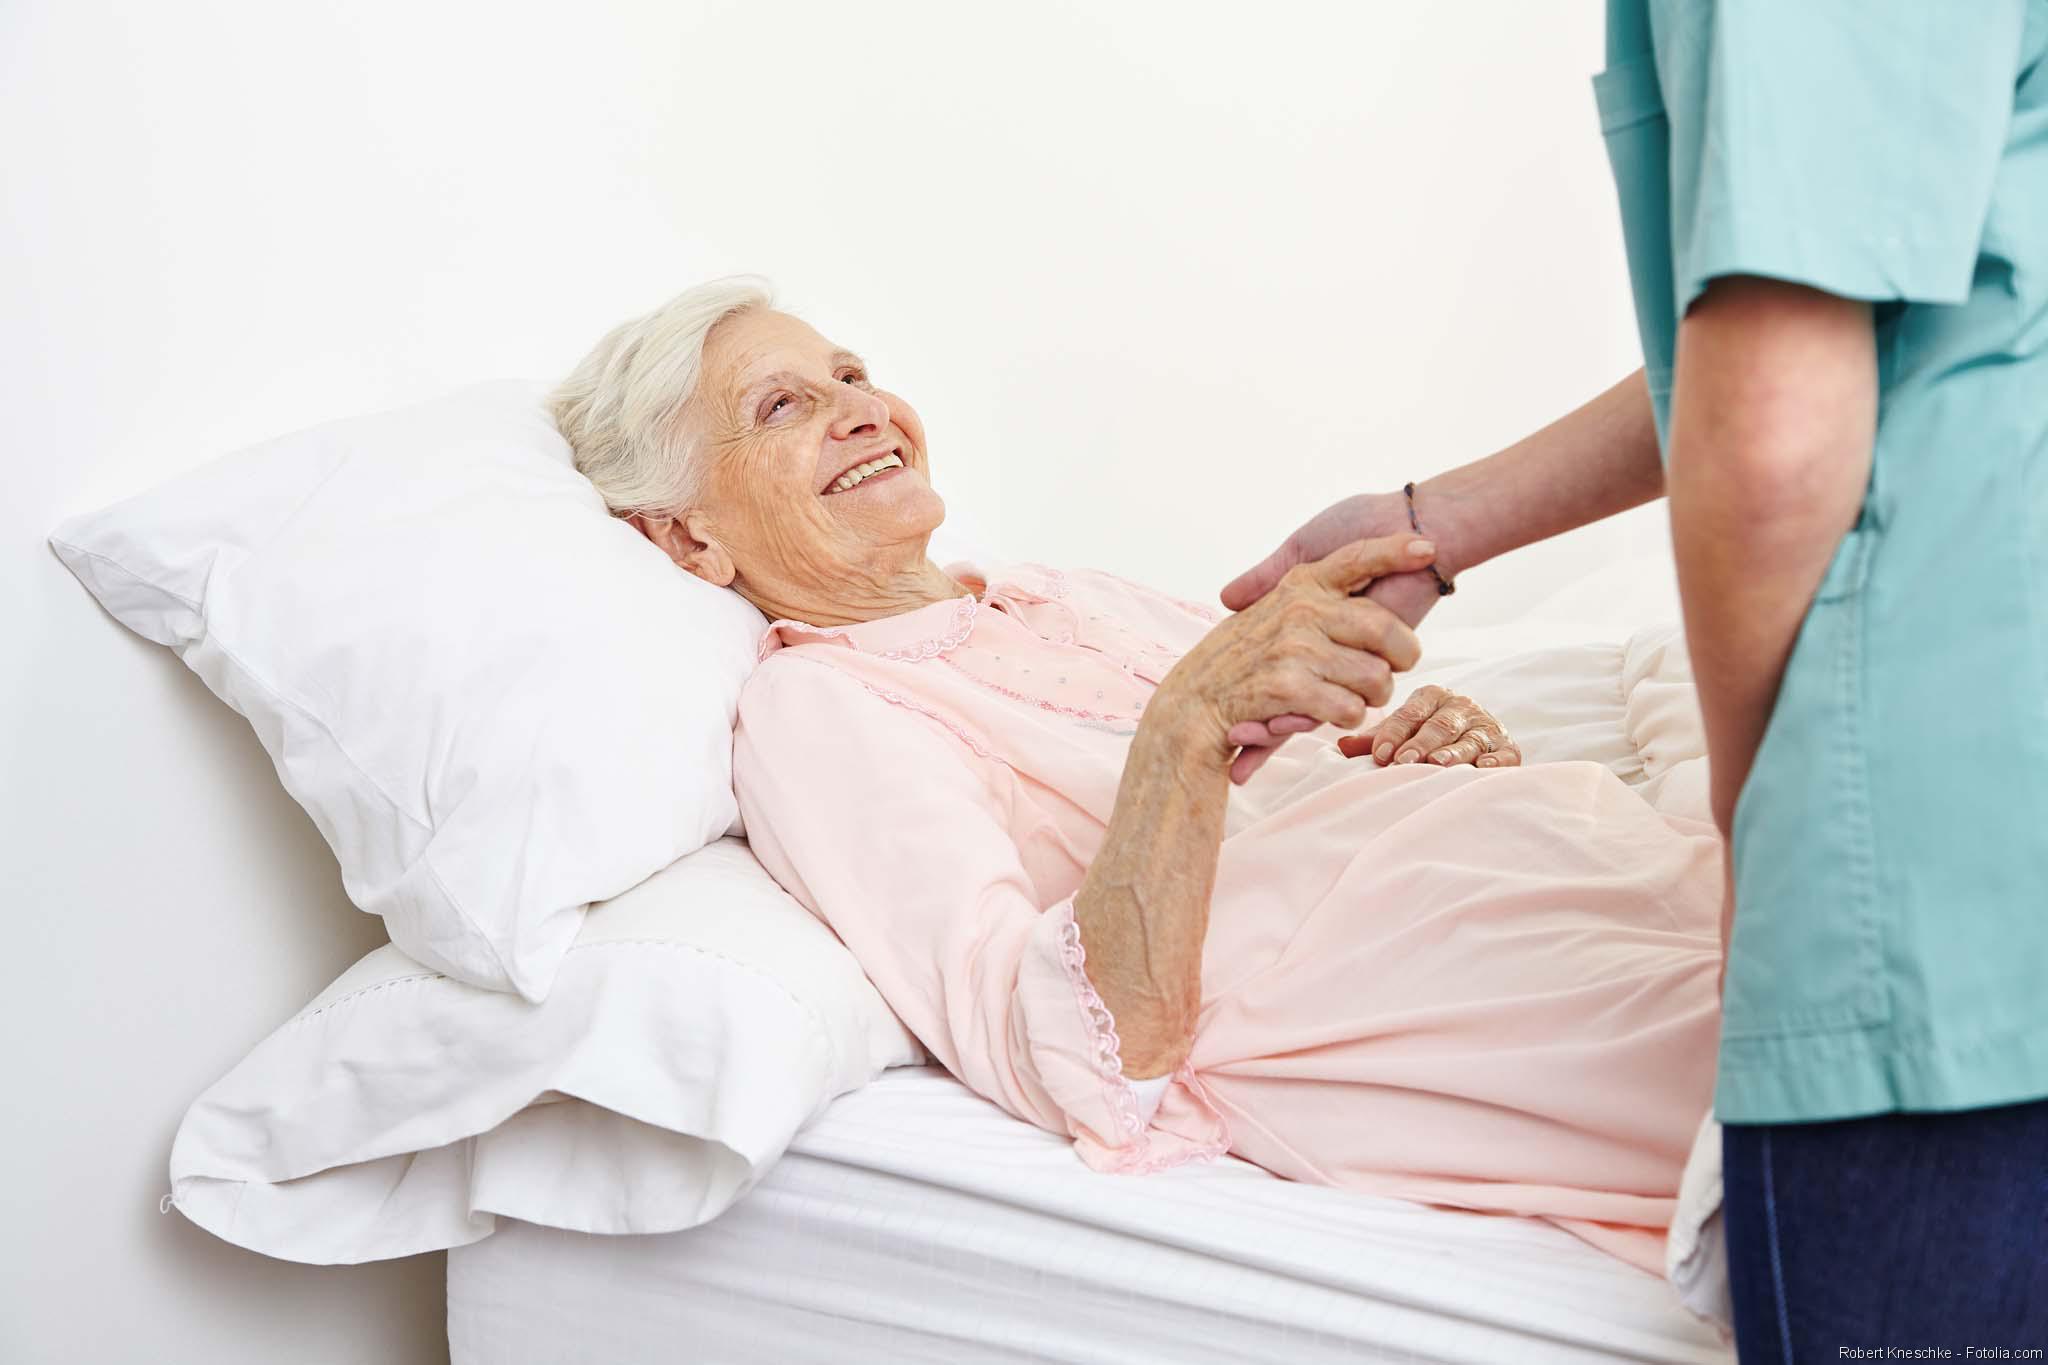 patientin_krankenhaus_pfleger